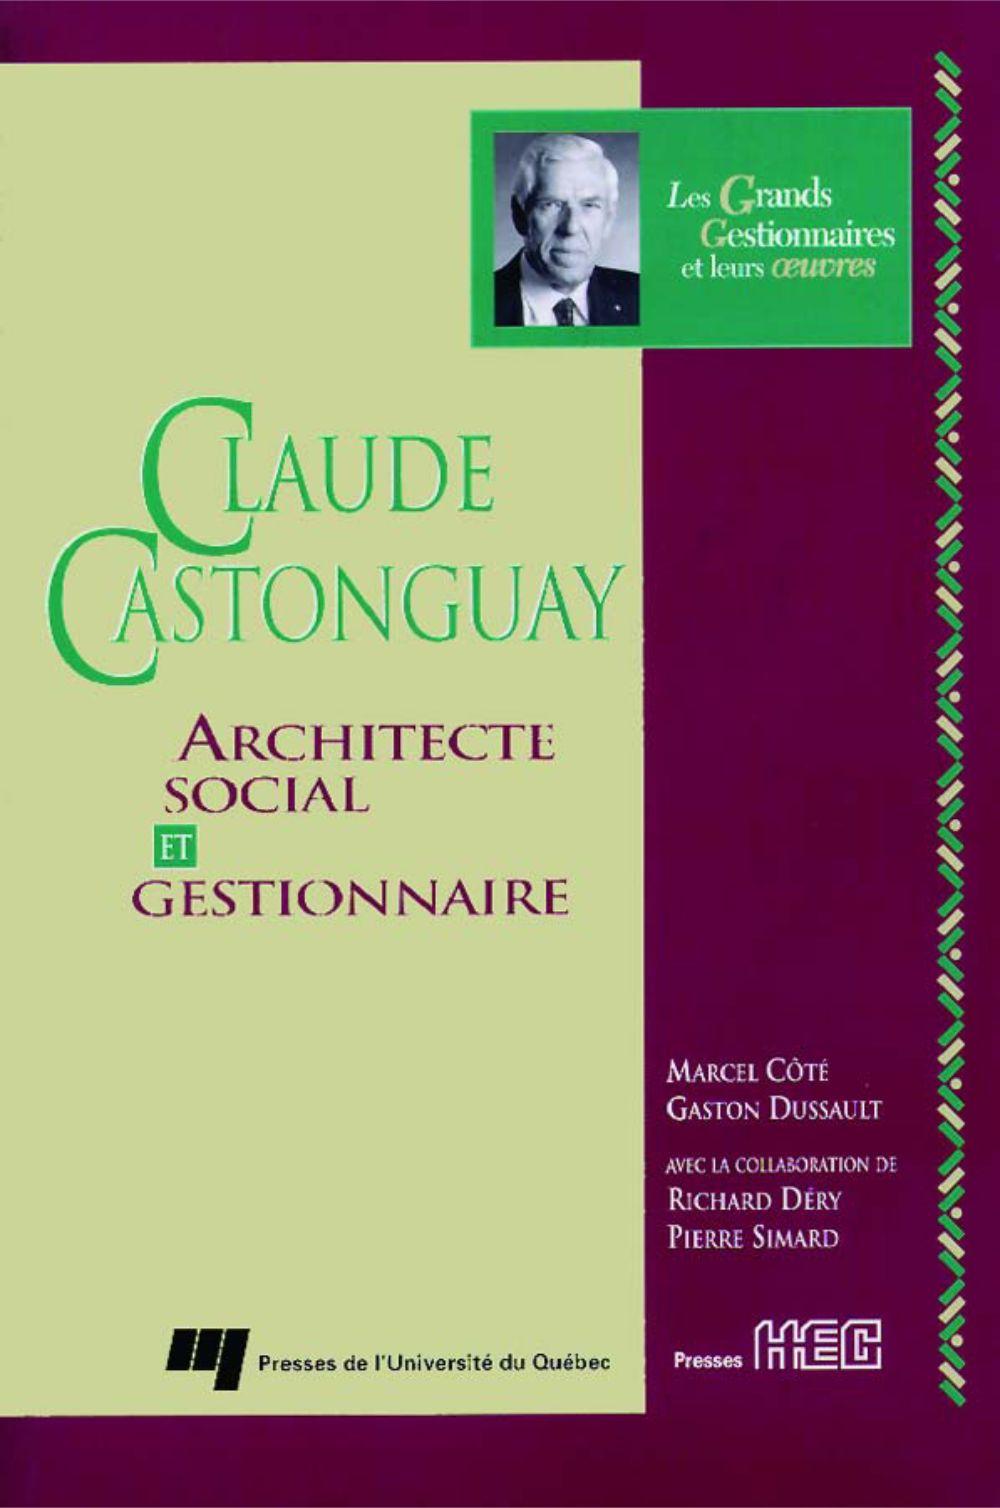 Claude Castonguay